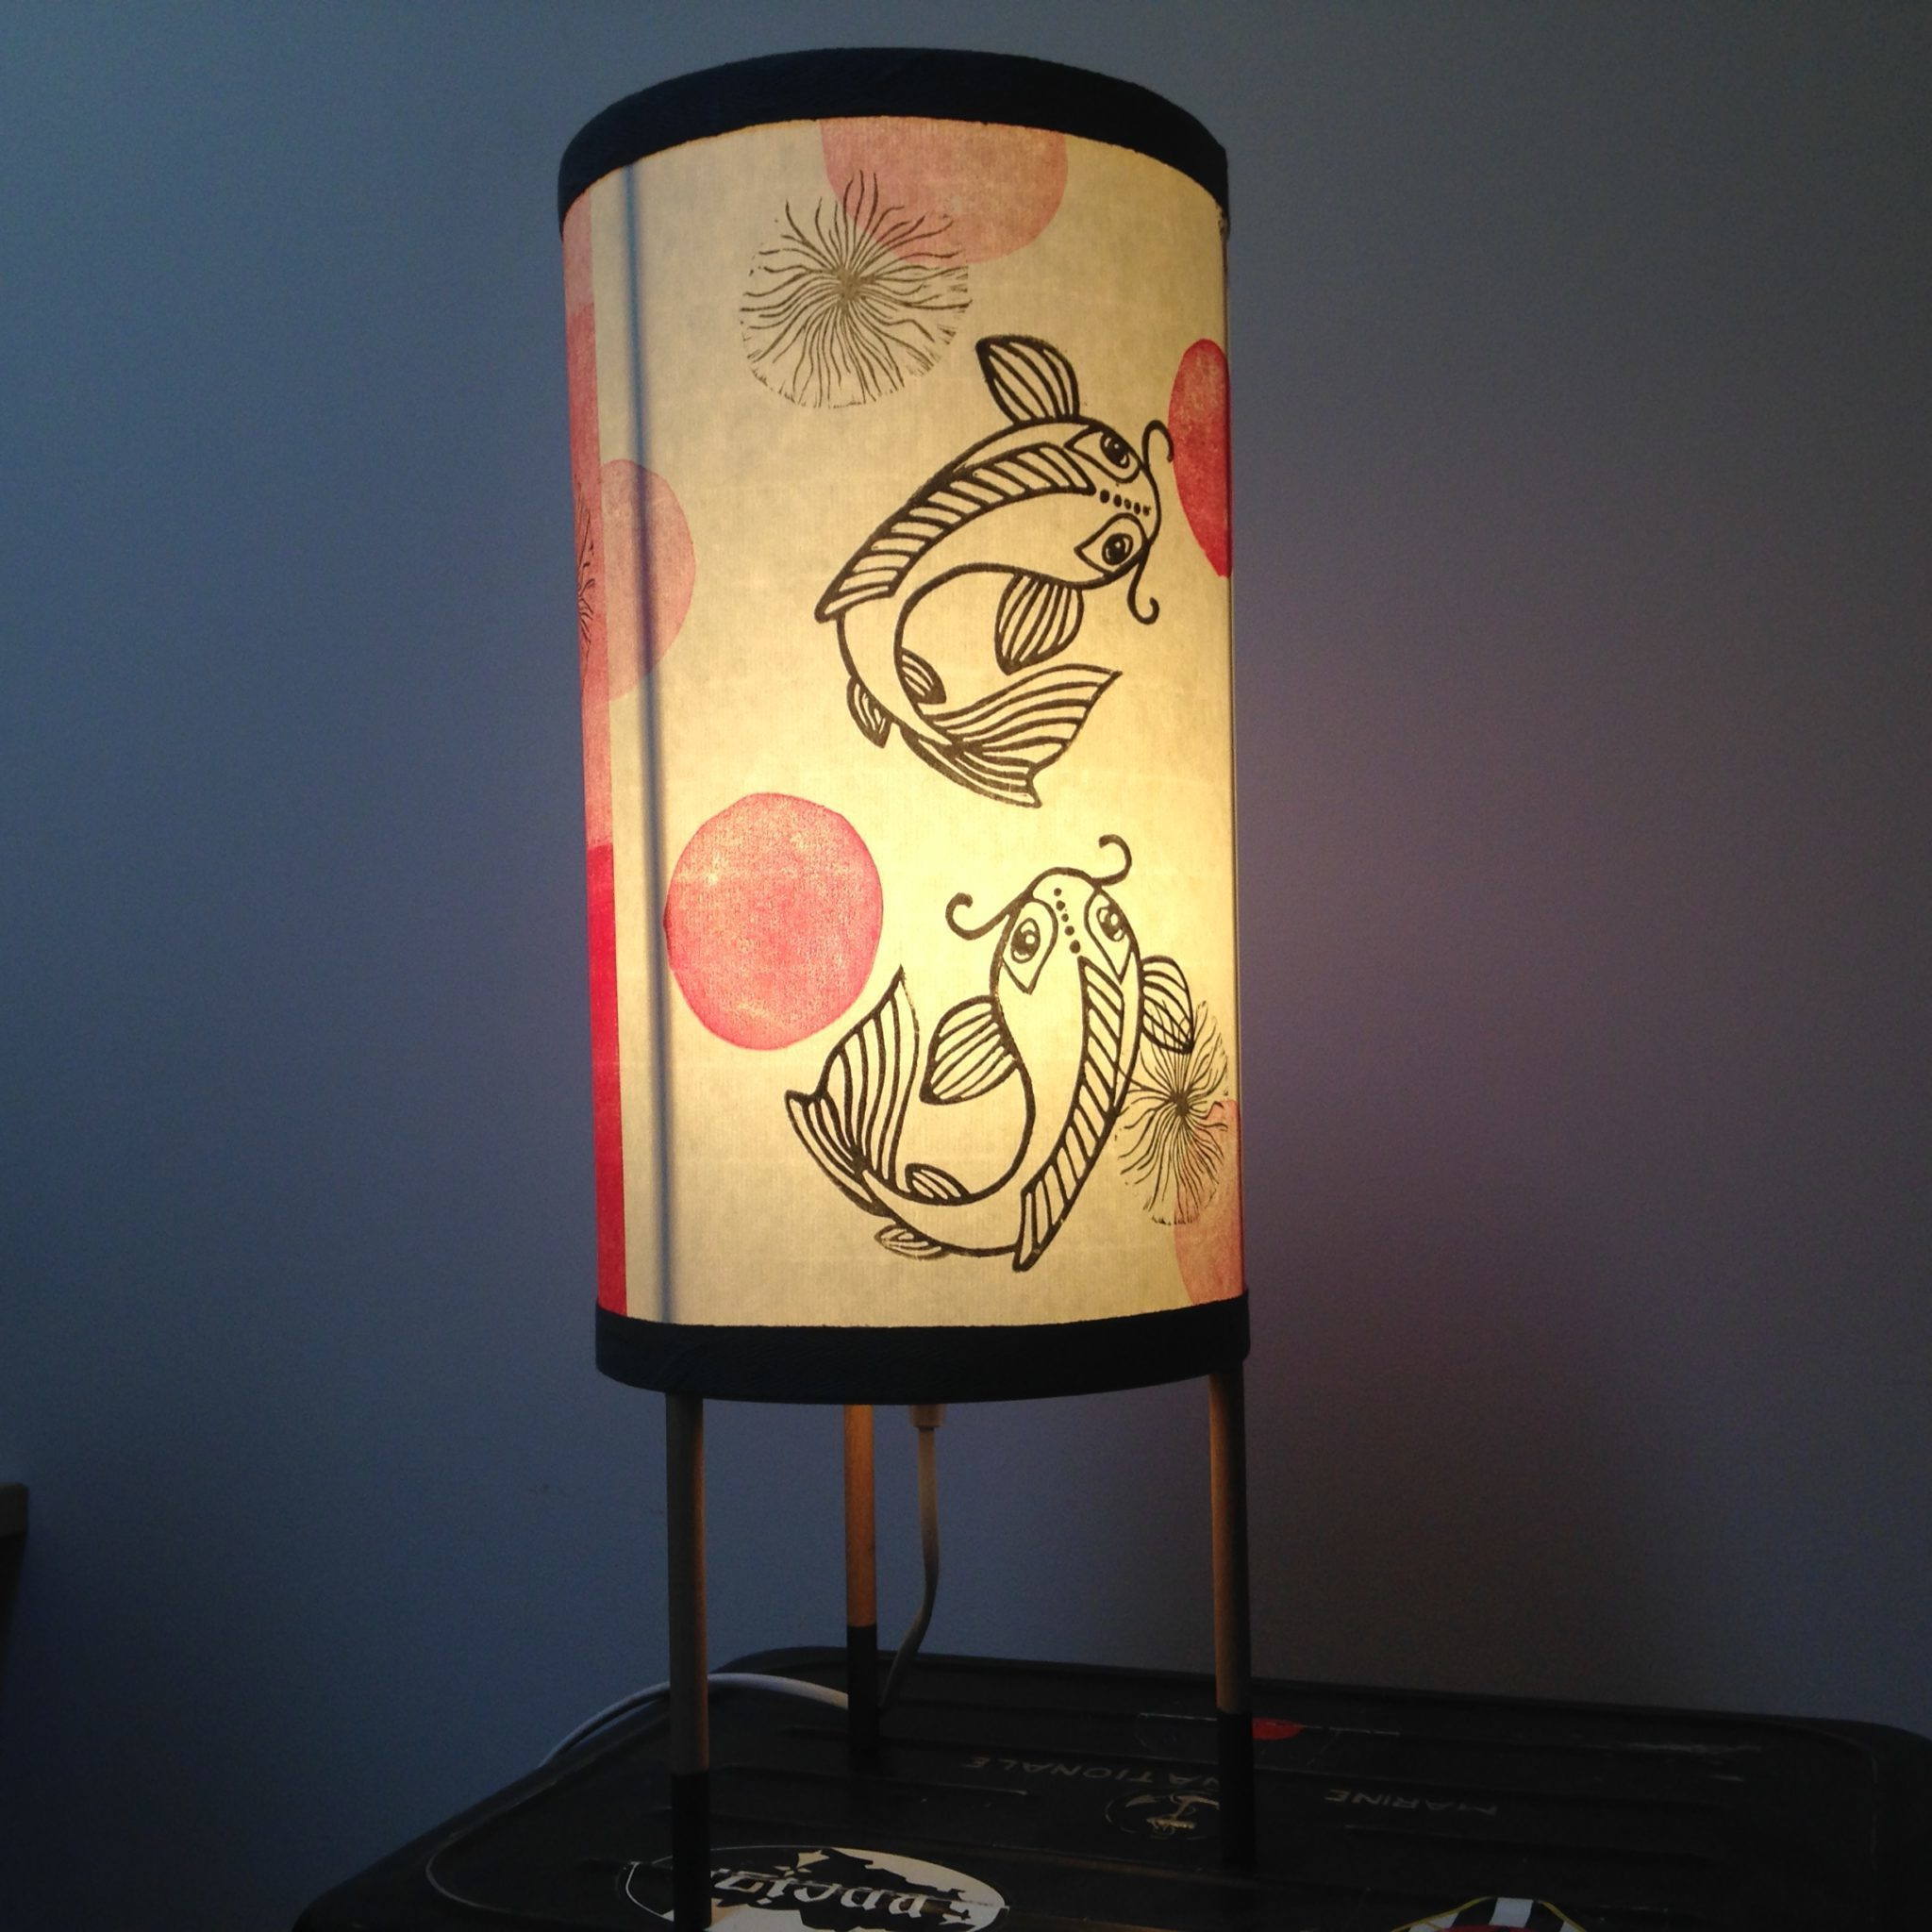 LinoLino | Linogravure et créations à partir d'impressions artisanales | Chambéry, France | Impression originale illustration lampe lightning luminaire